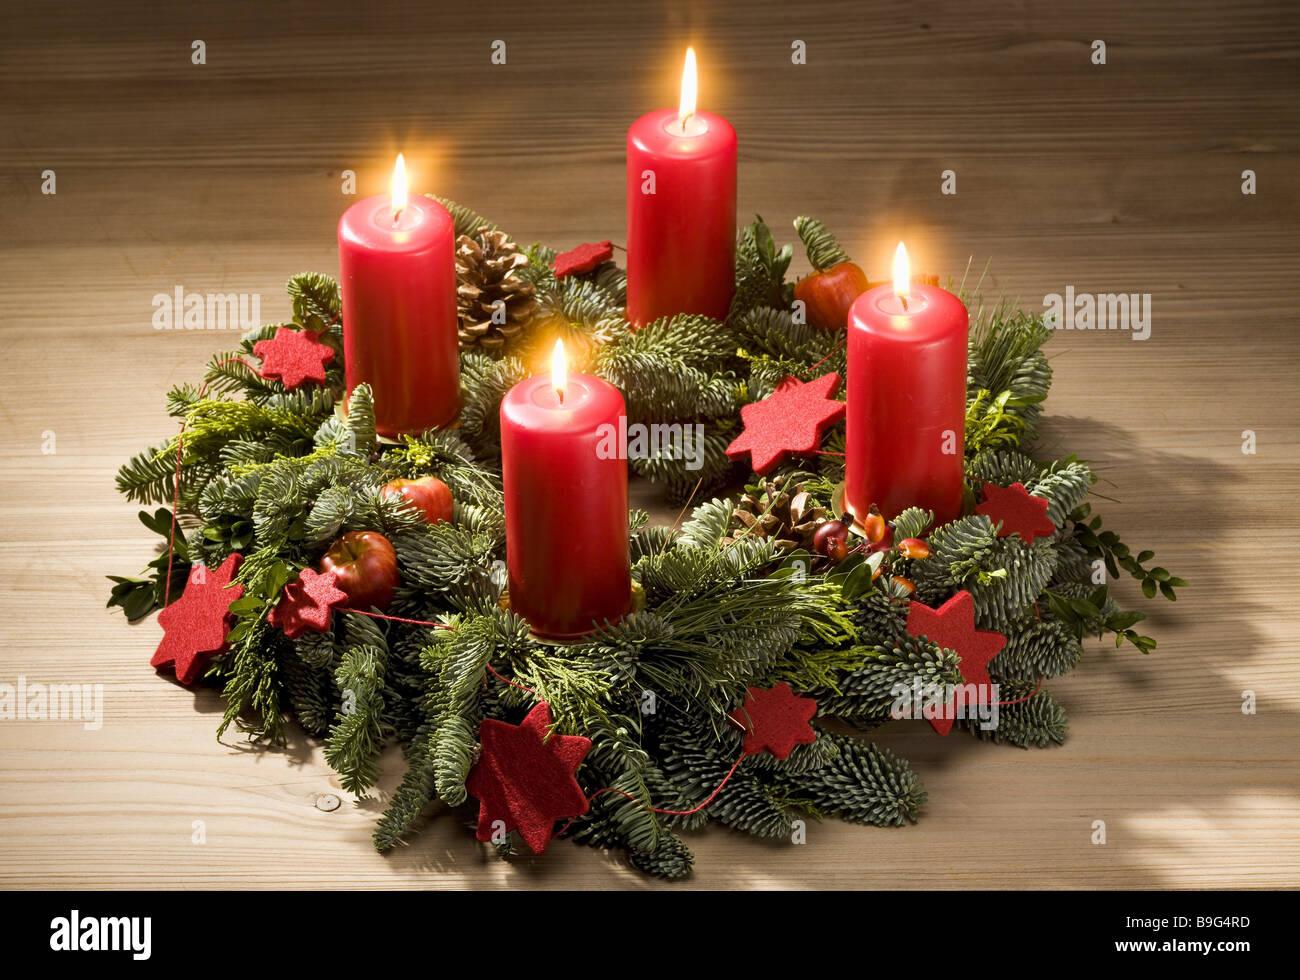 Christmas Table Advent Wreath Candles Advent Time Burn